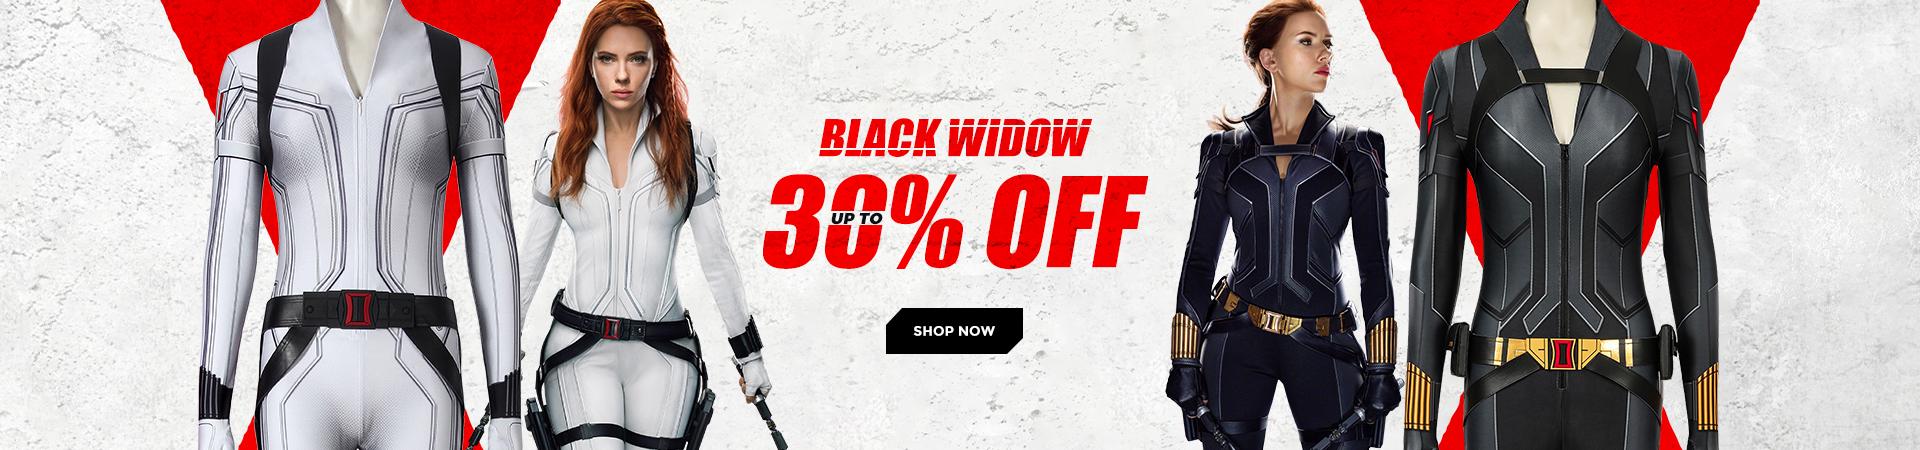 944B9A61A523D263DCDC1A211114C881 - Up to 30% off for Black Widow